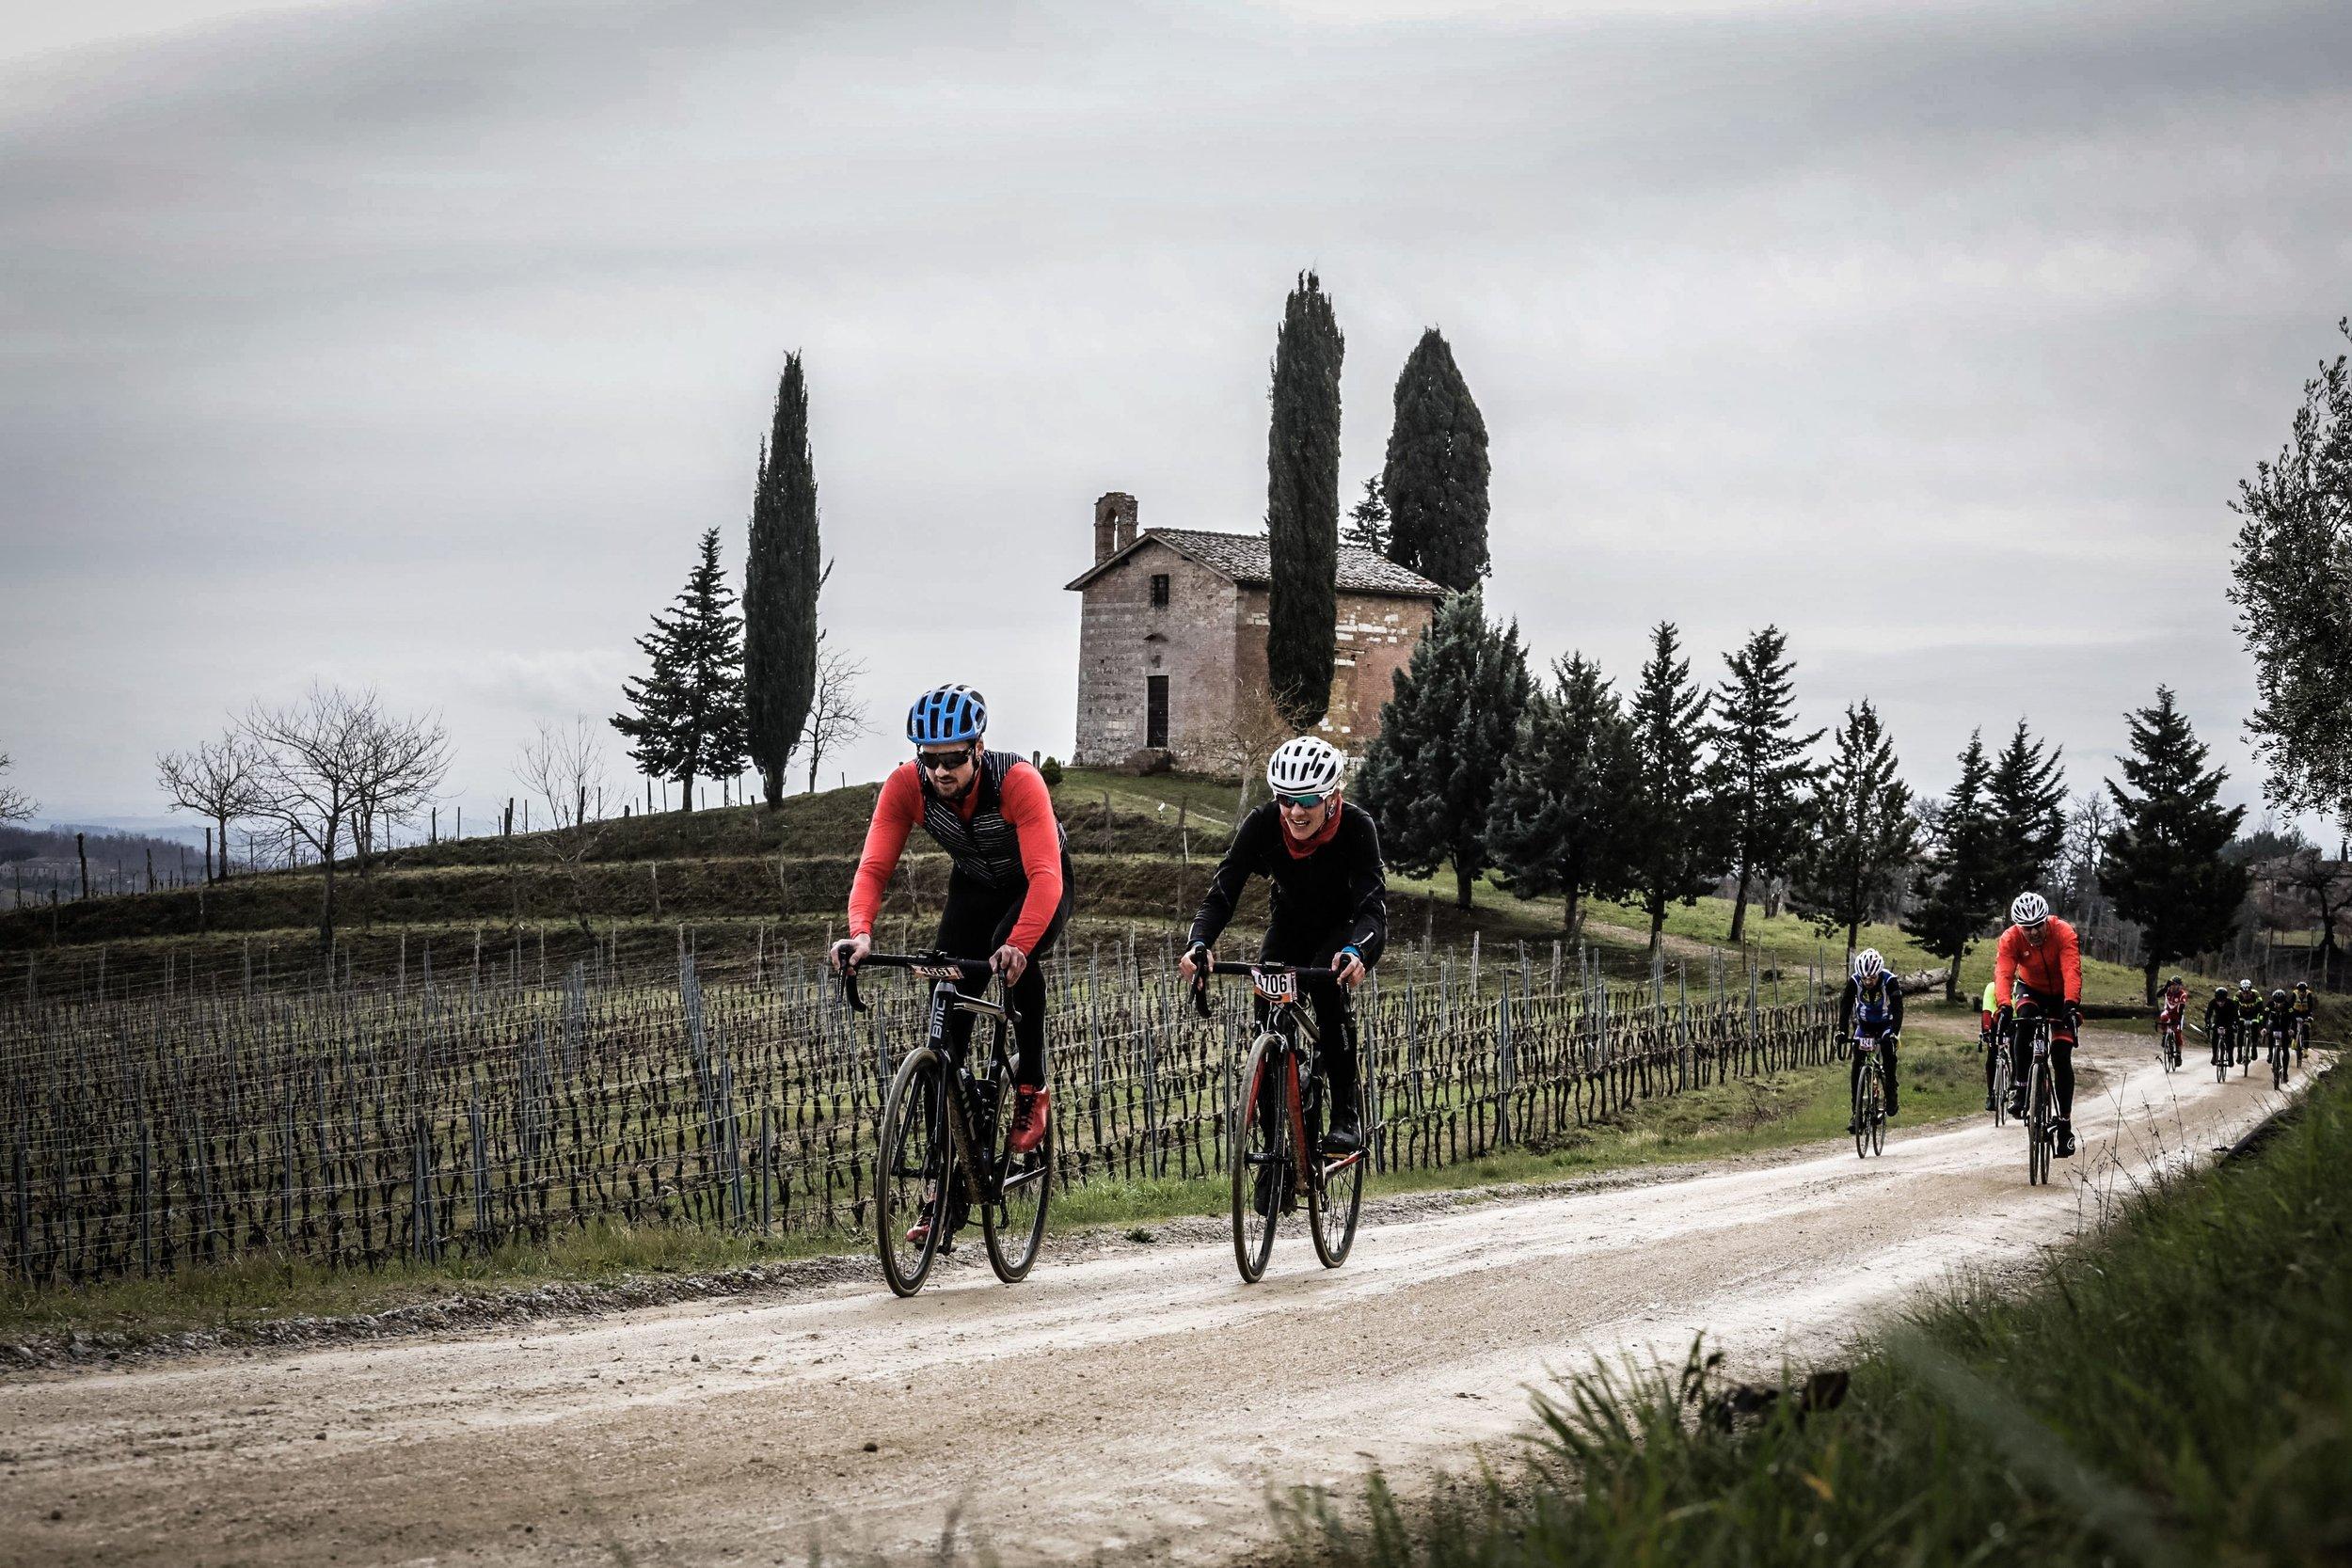 Gran Fondo Strade Bianche: where amateurs duke it out. Photograph: Sportograf.com